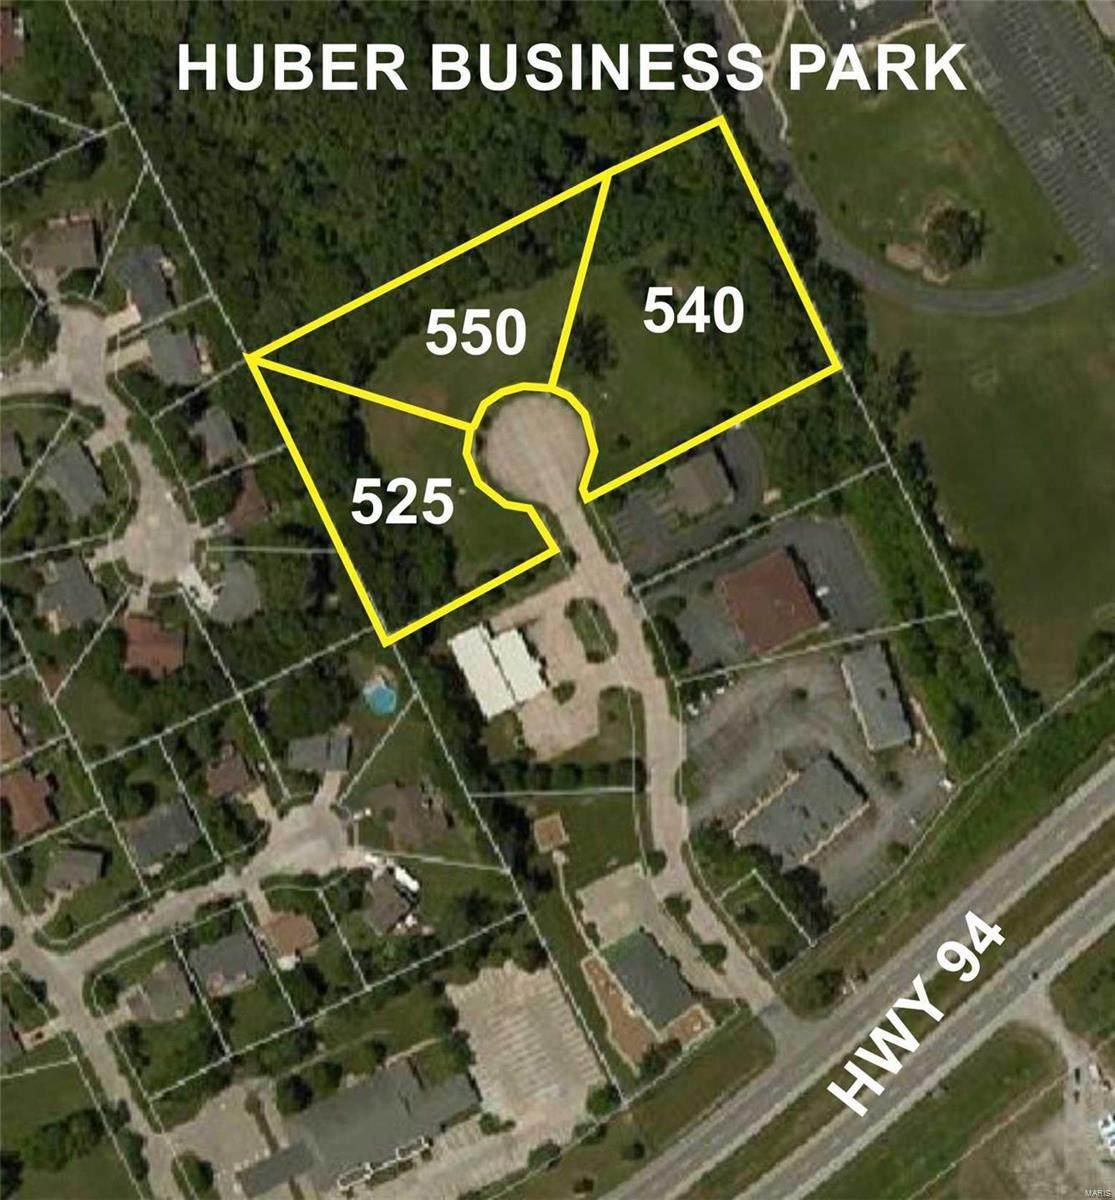 540 Huber Park, Weldon Spring, MO 63304 (#15015432) :: Clarity Street Realty